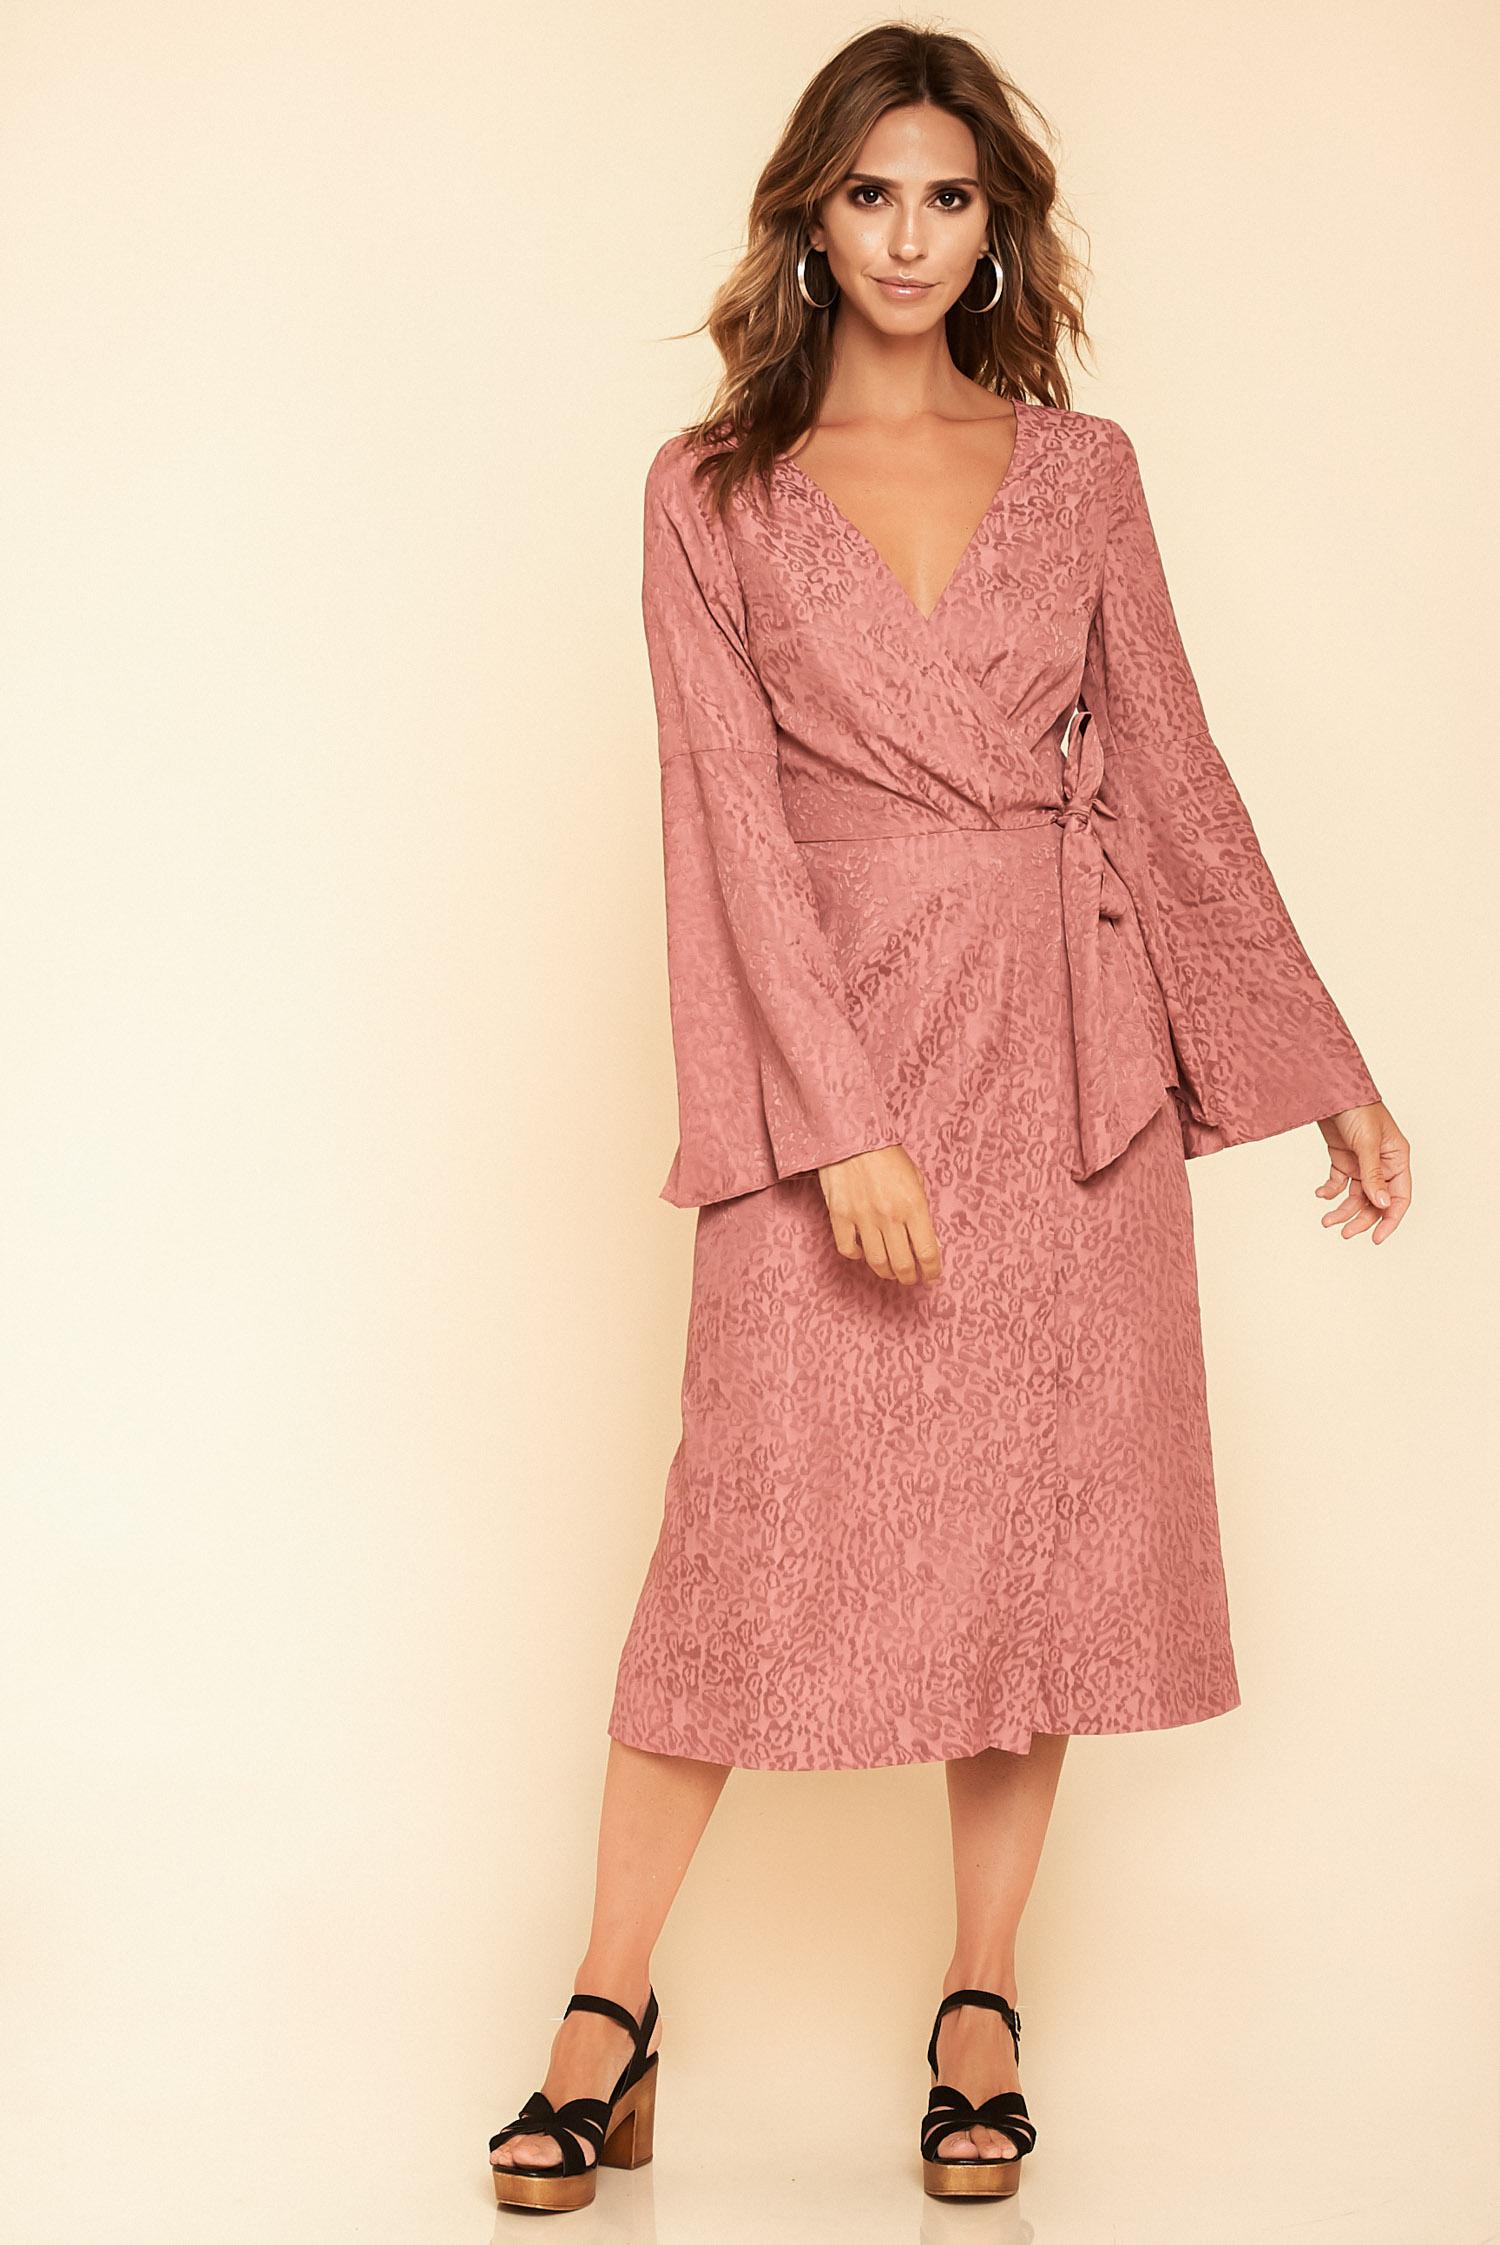 07afa6cdf1 Finders Keepers  Heatwave Dress - BitterSweet Boutique